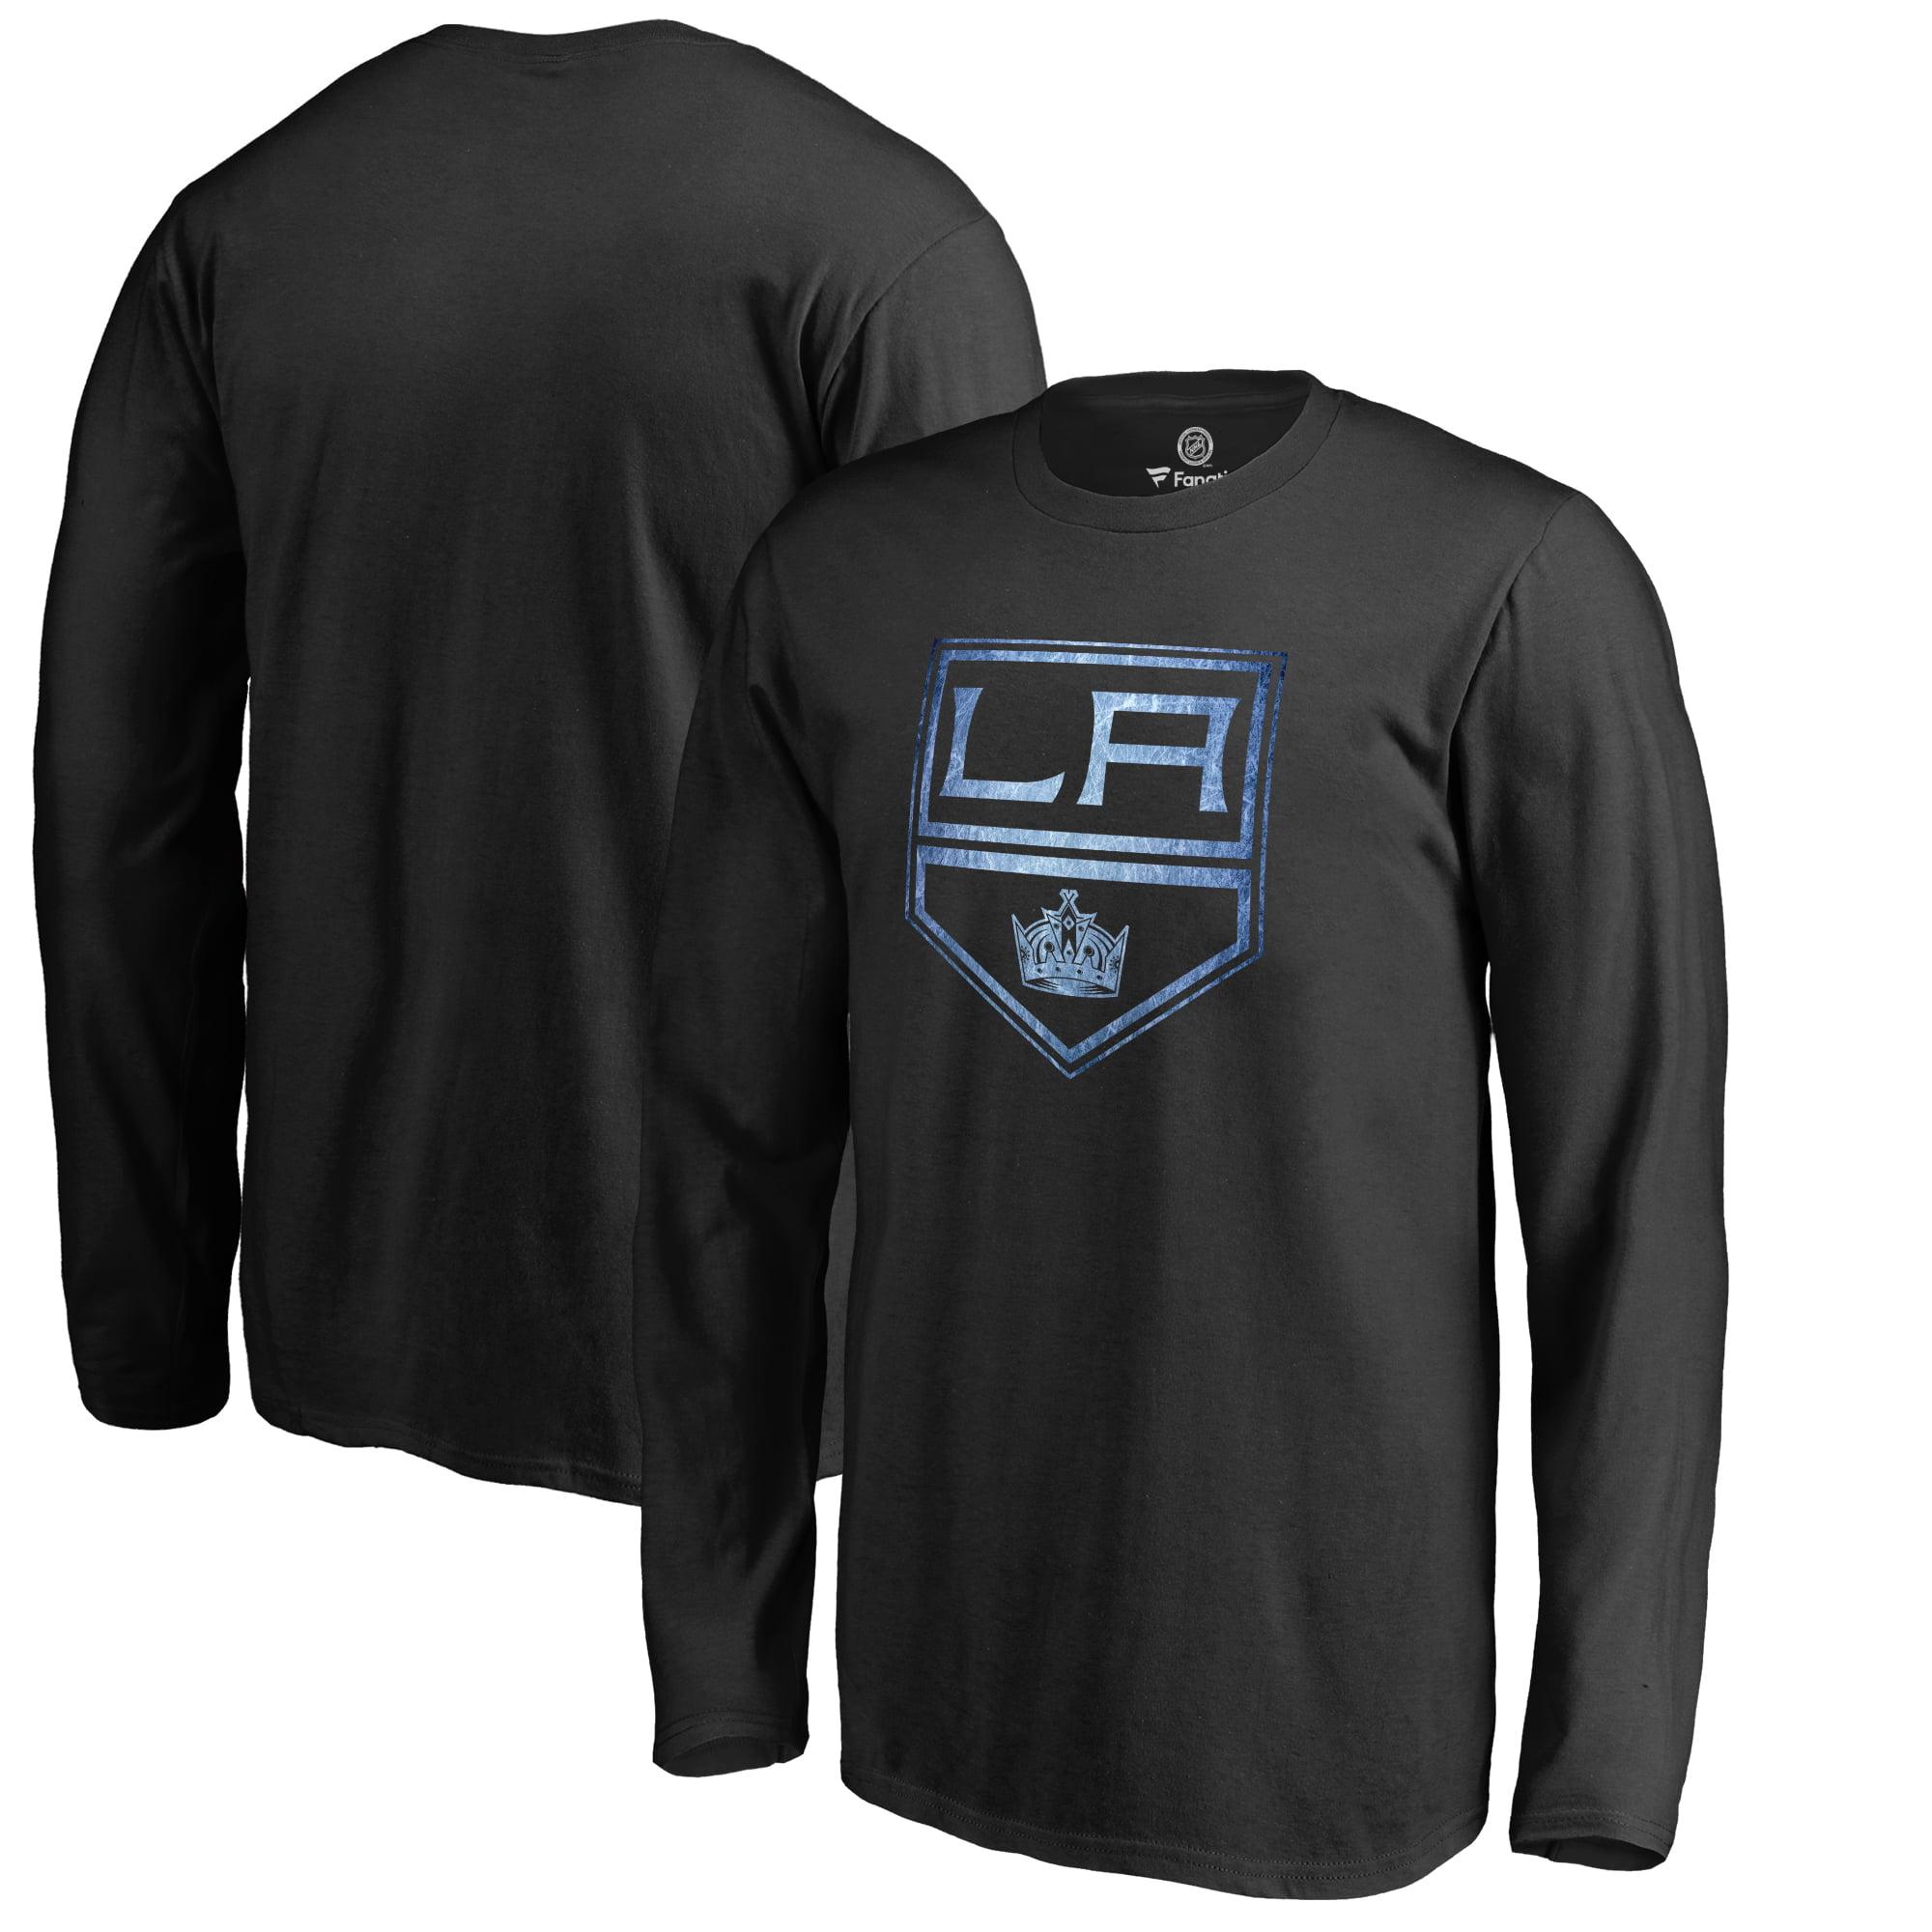 Los Angeles Kings Youth Pond Hockey Long Sleeve T-Shirt Black by Football Fanatics/Ruppshirts